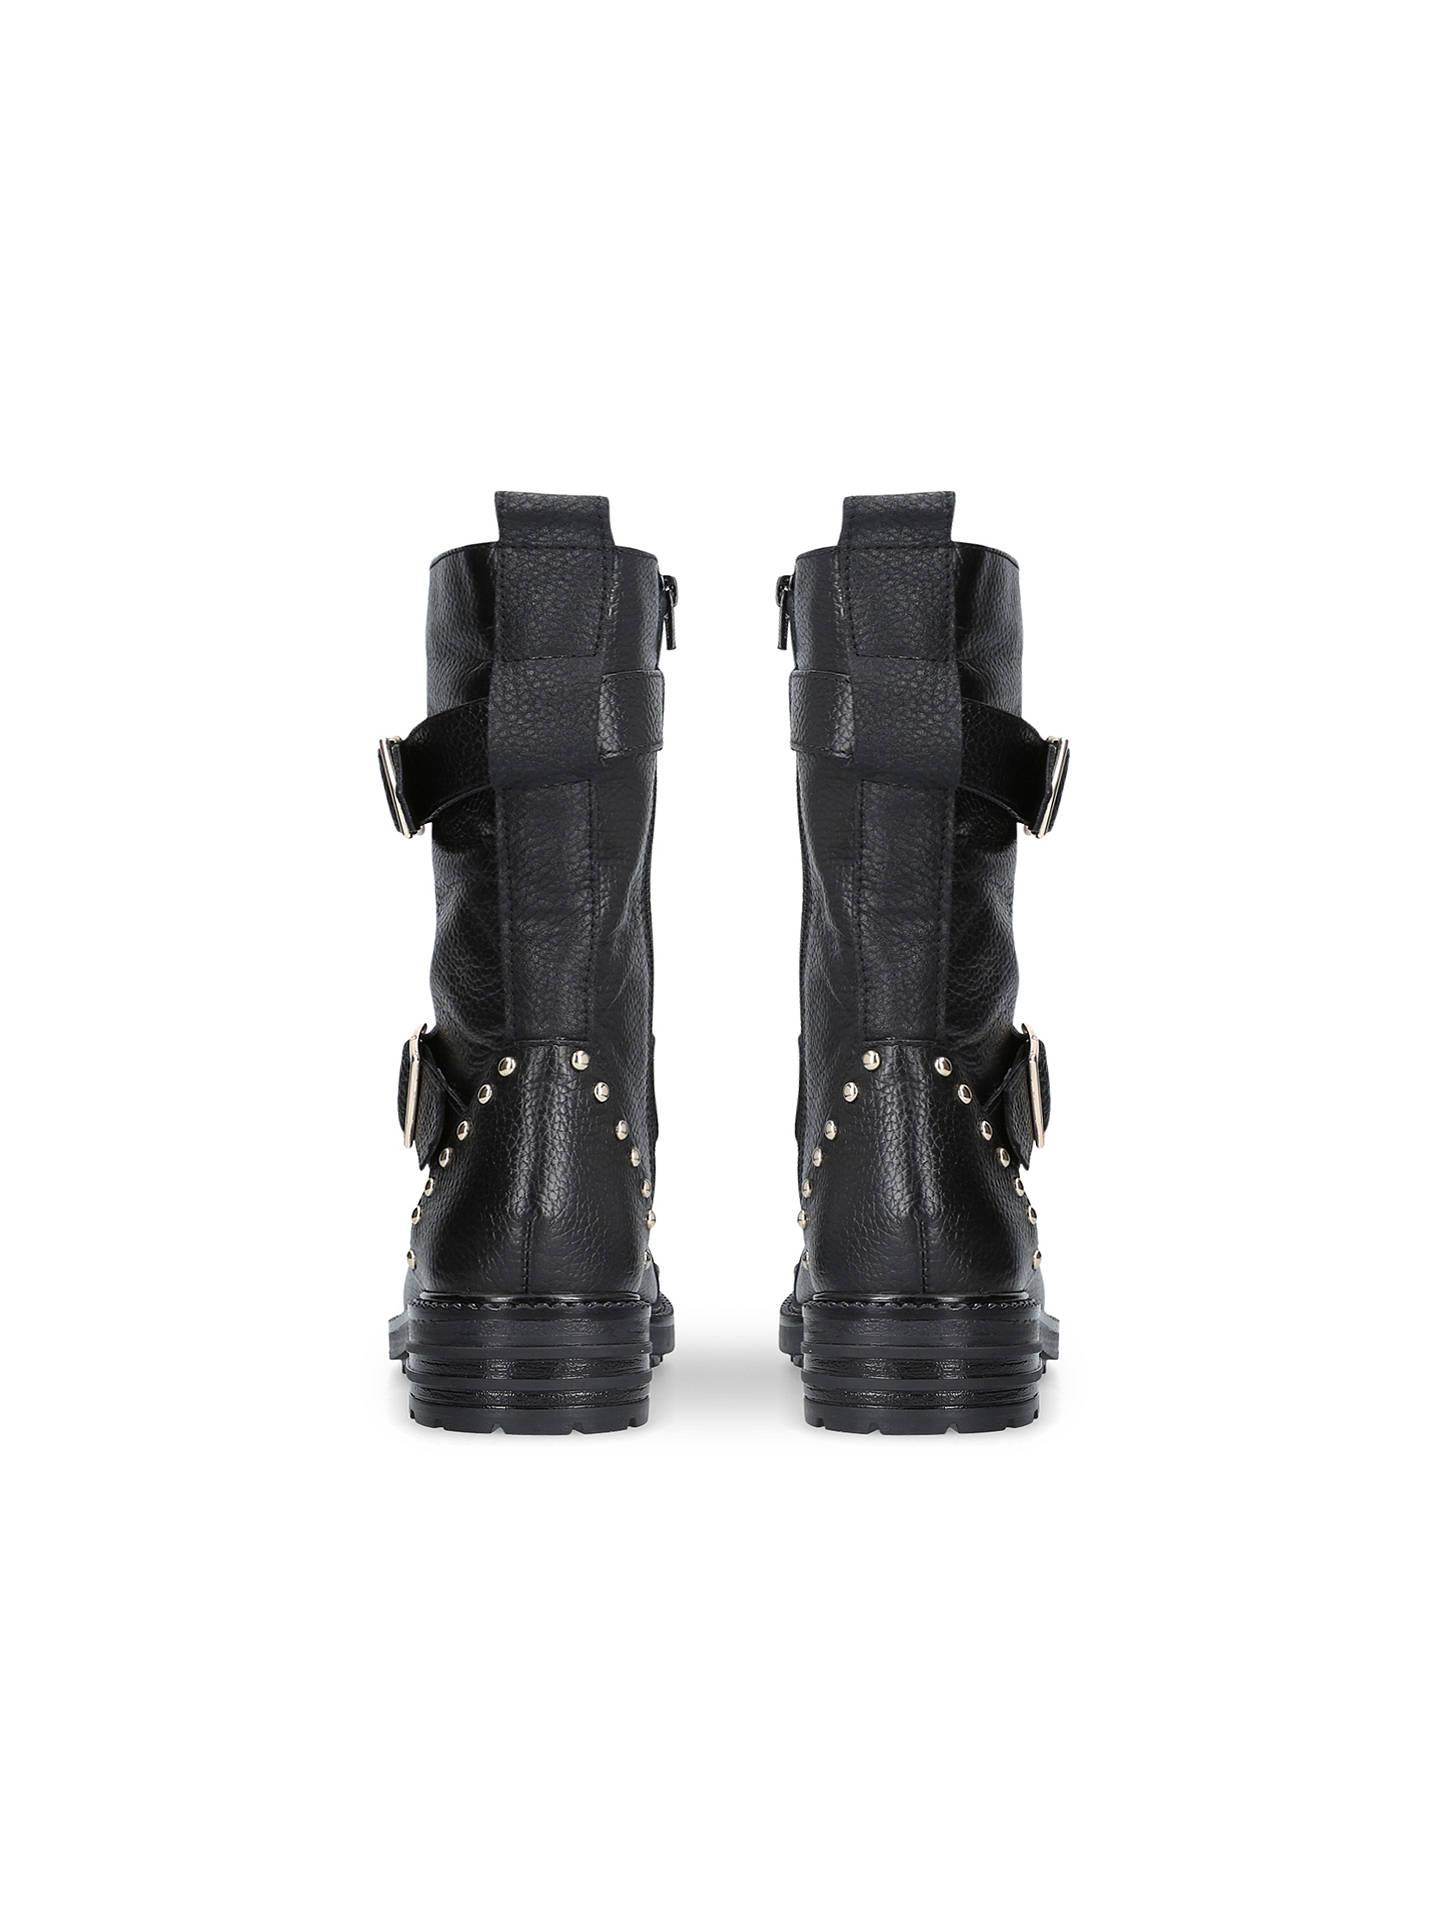 a3dde9d72ca Kurt Geiger London Sting Biker Boots, Black Leather